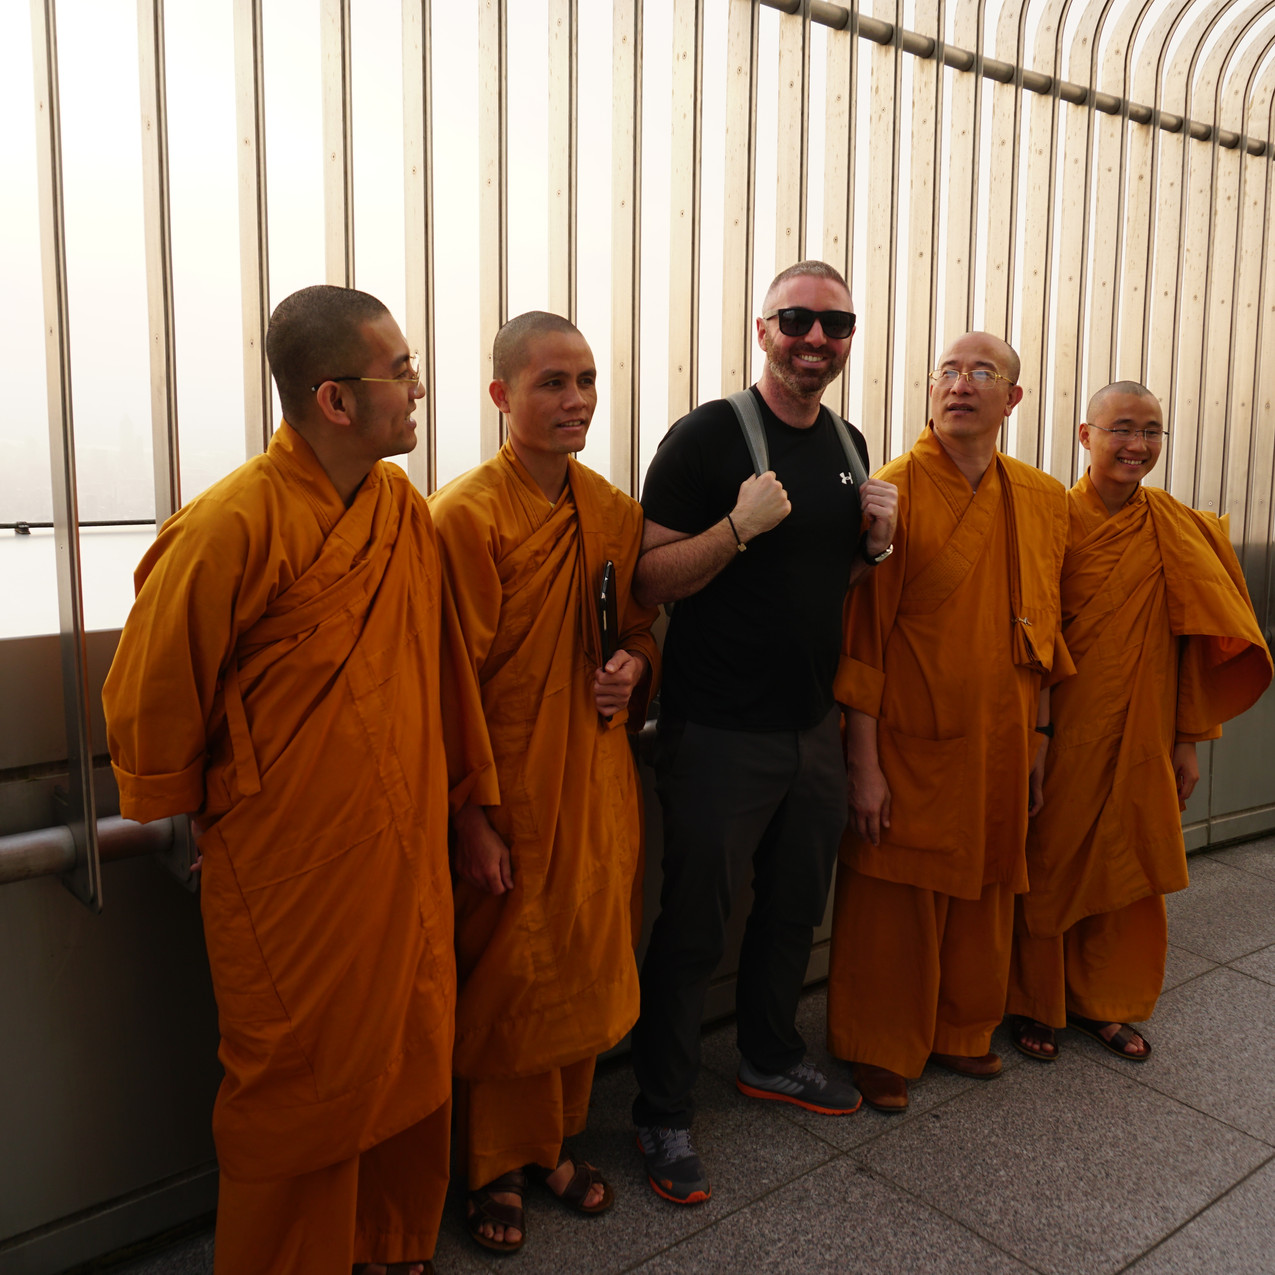 Meeting Monks